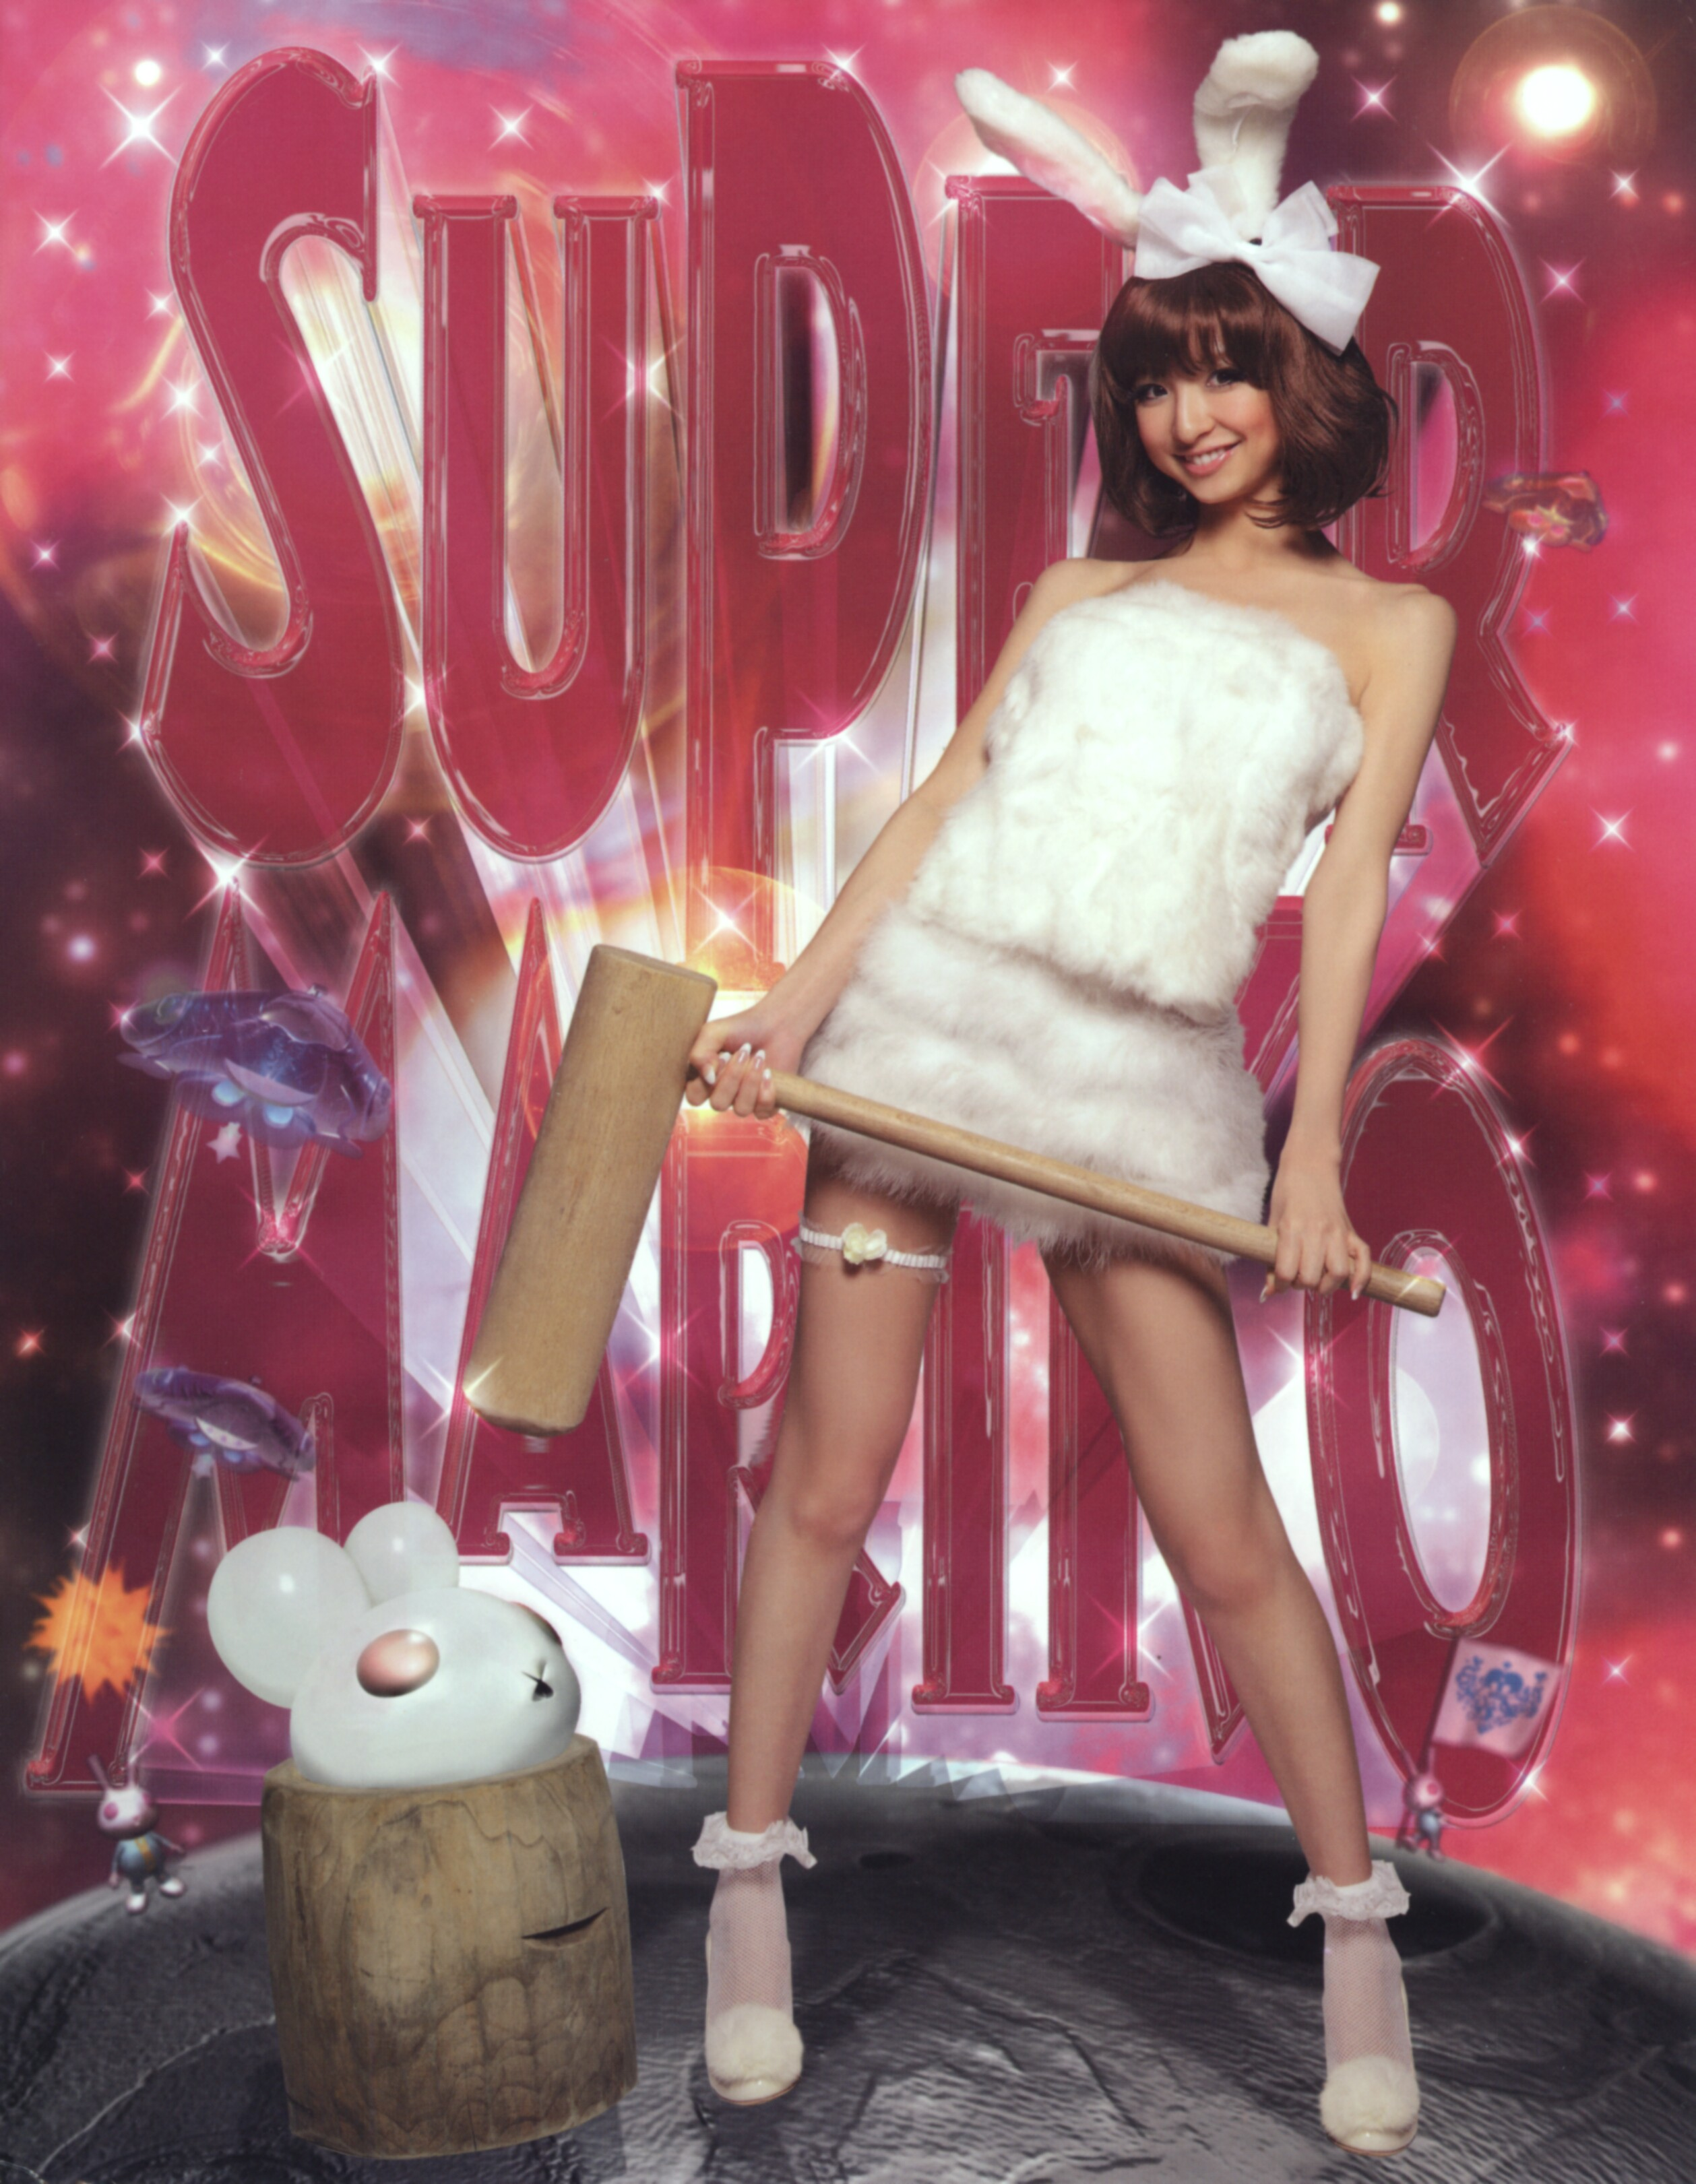 20151209.10.02 Mariko Shinoda - Super Mariko (photobook) (2009) 001 (JPOP.ru).jpg